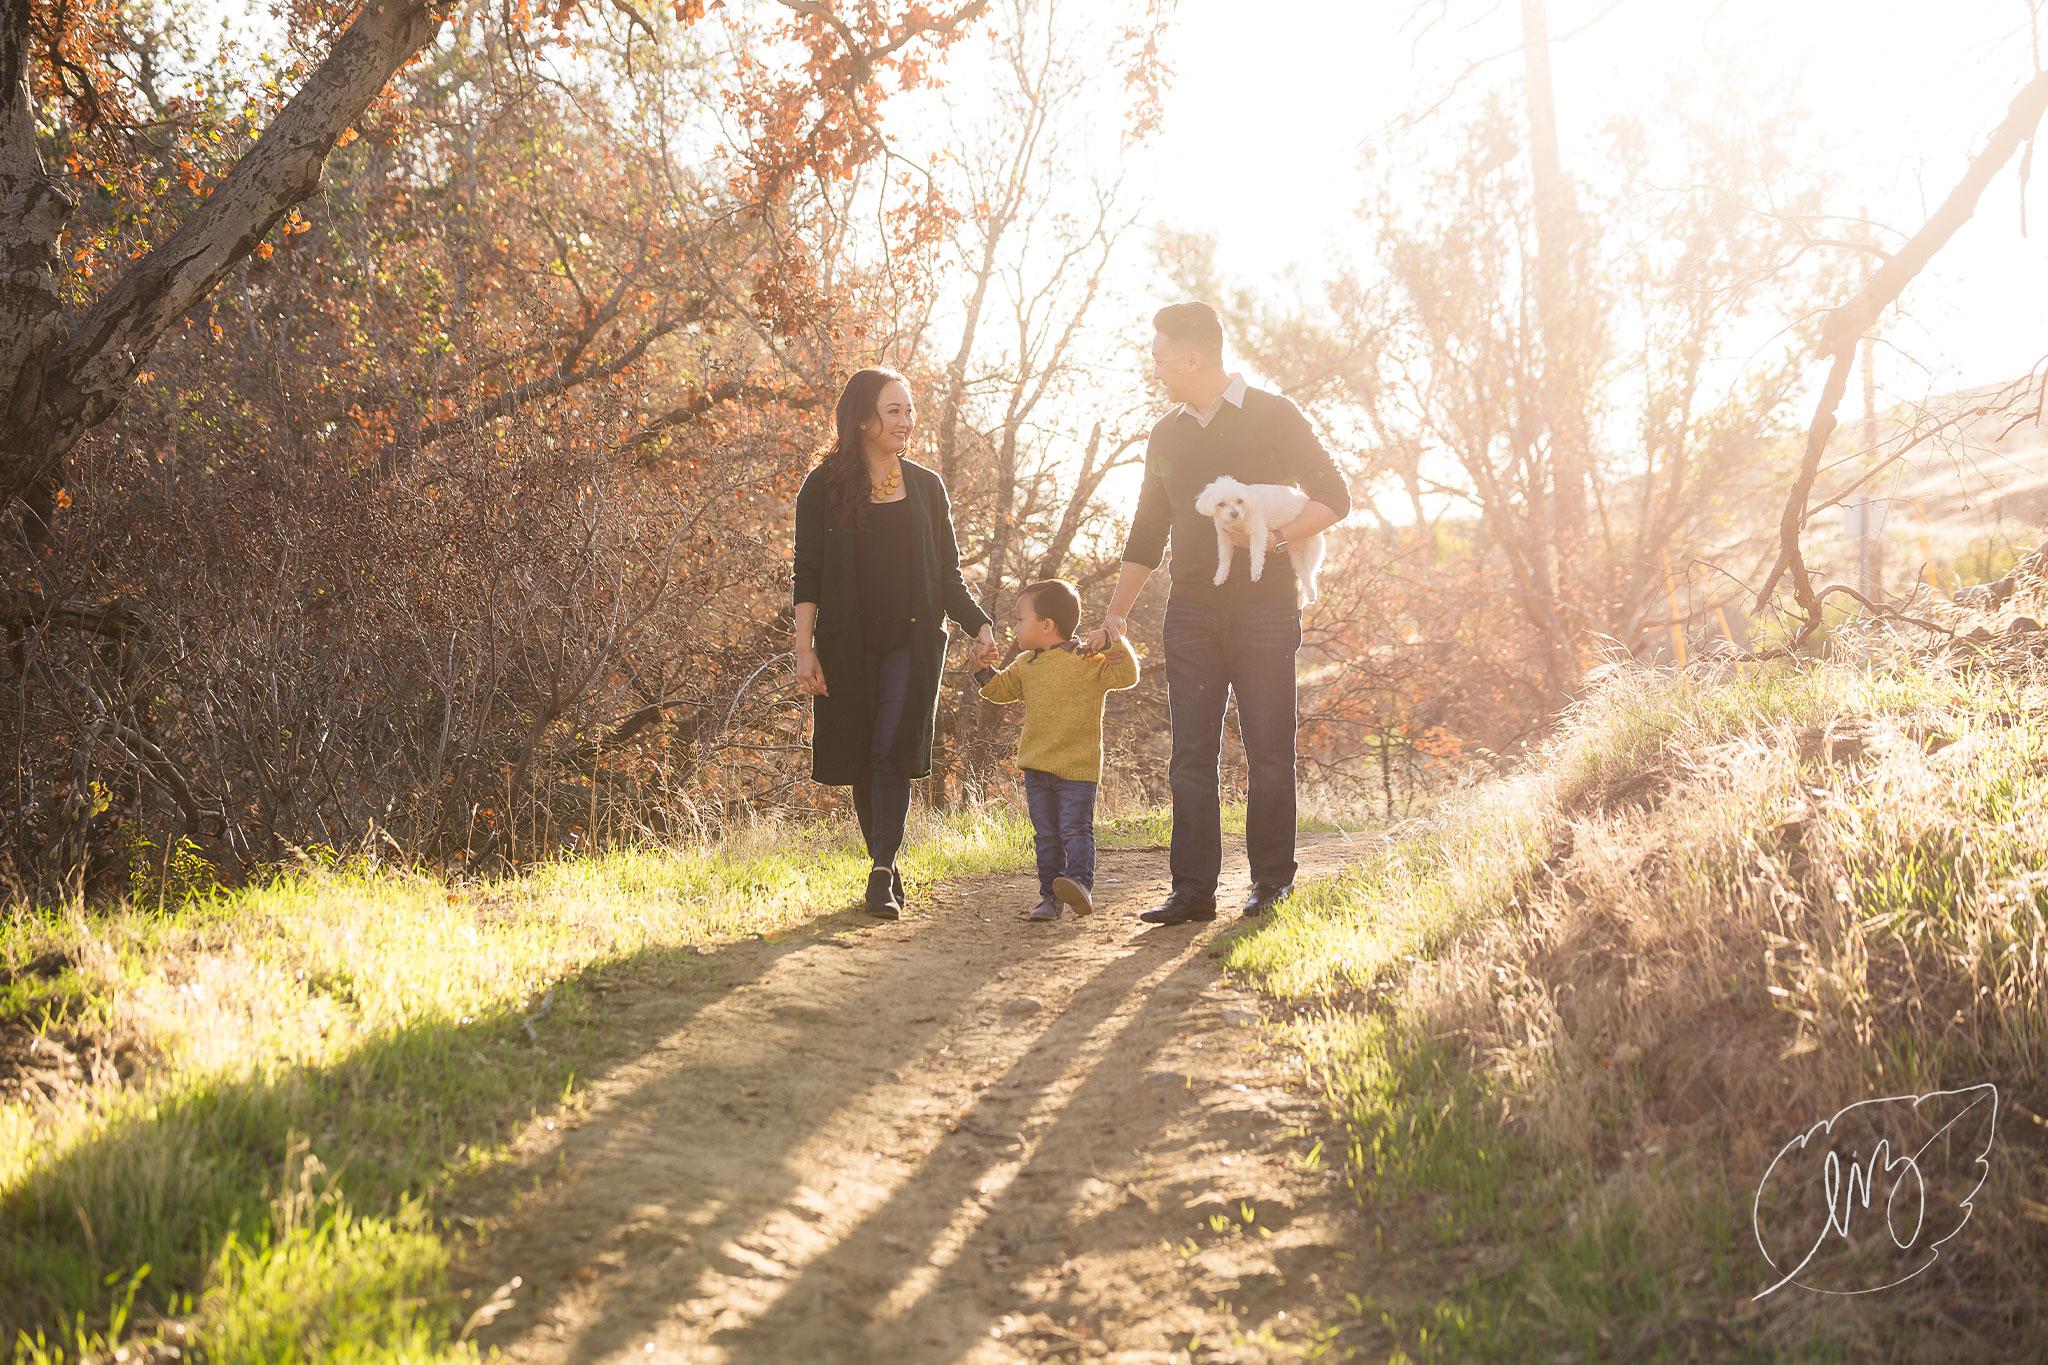 California_Inland_Empire_Family_Photographer_01.jpg